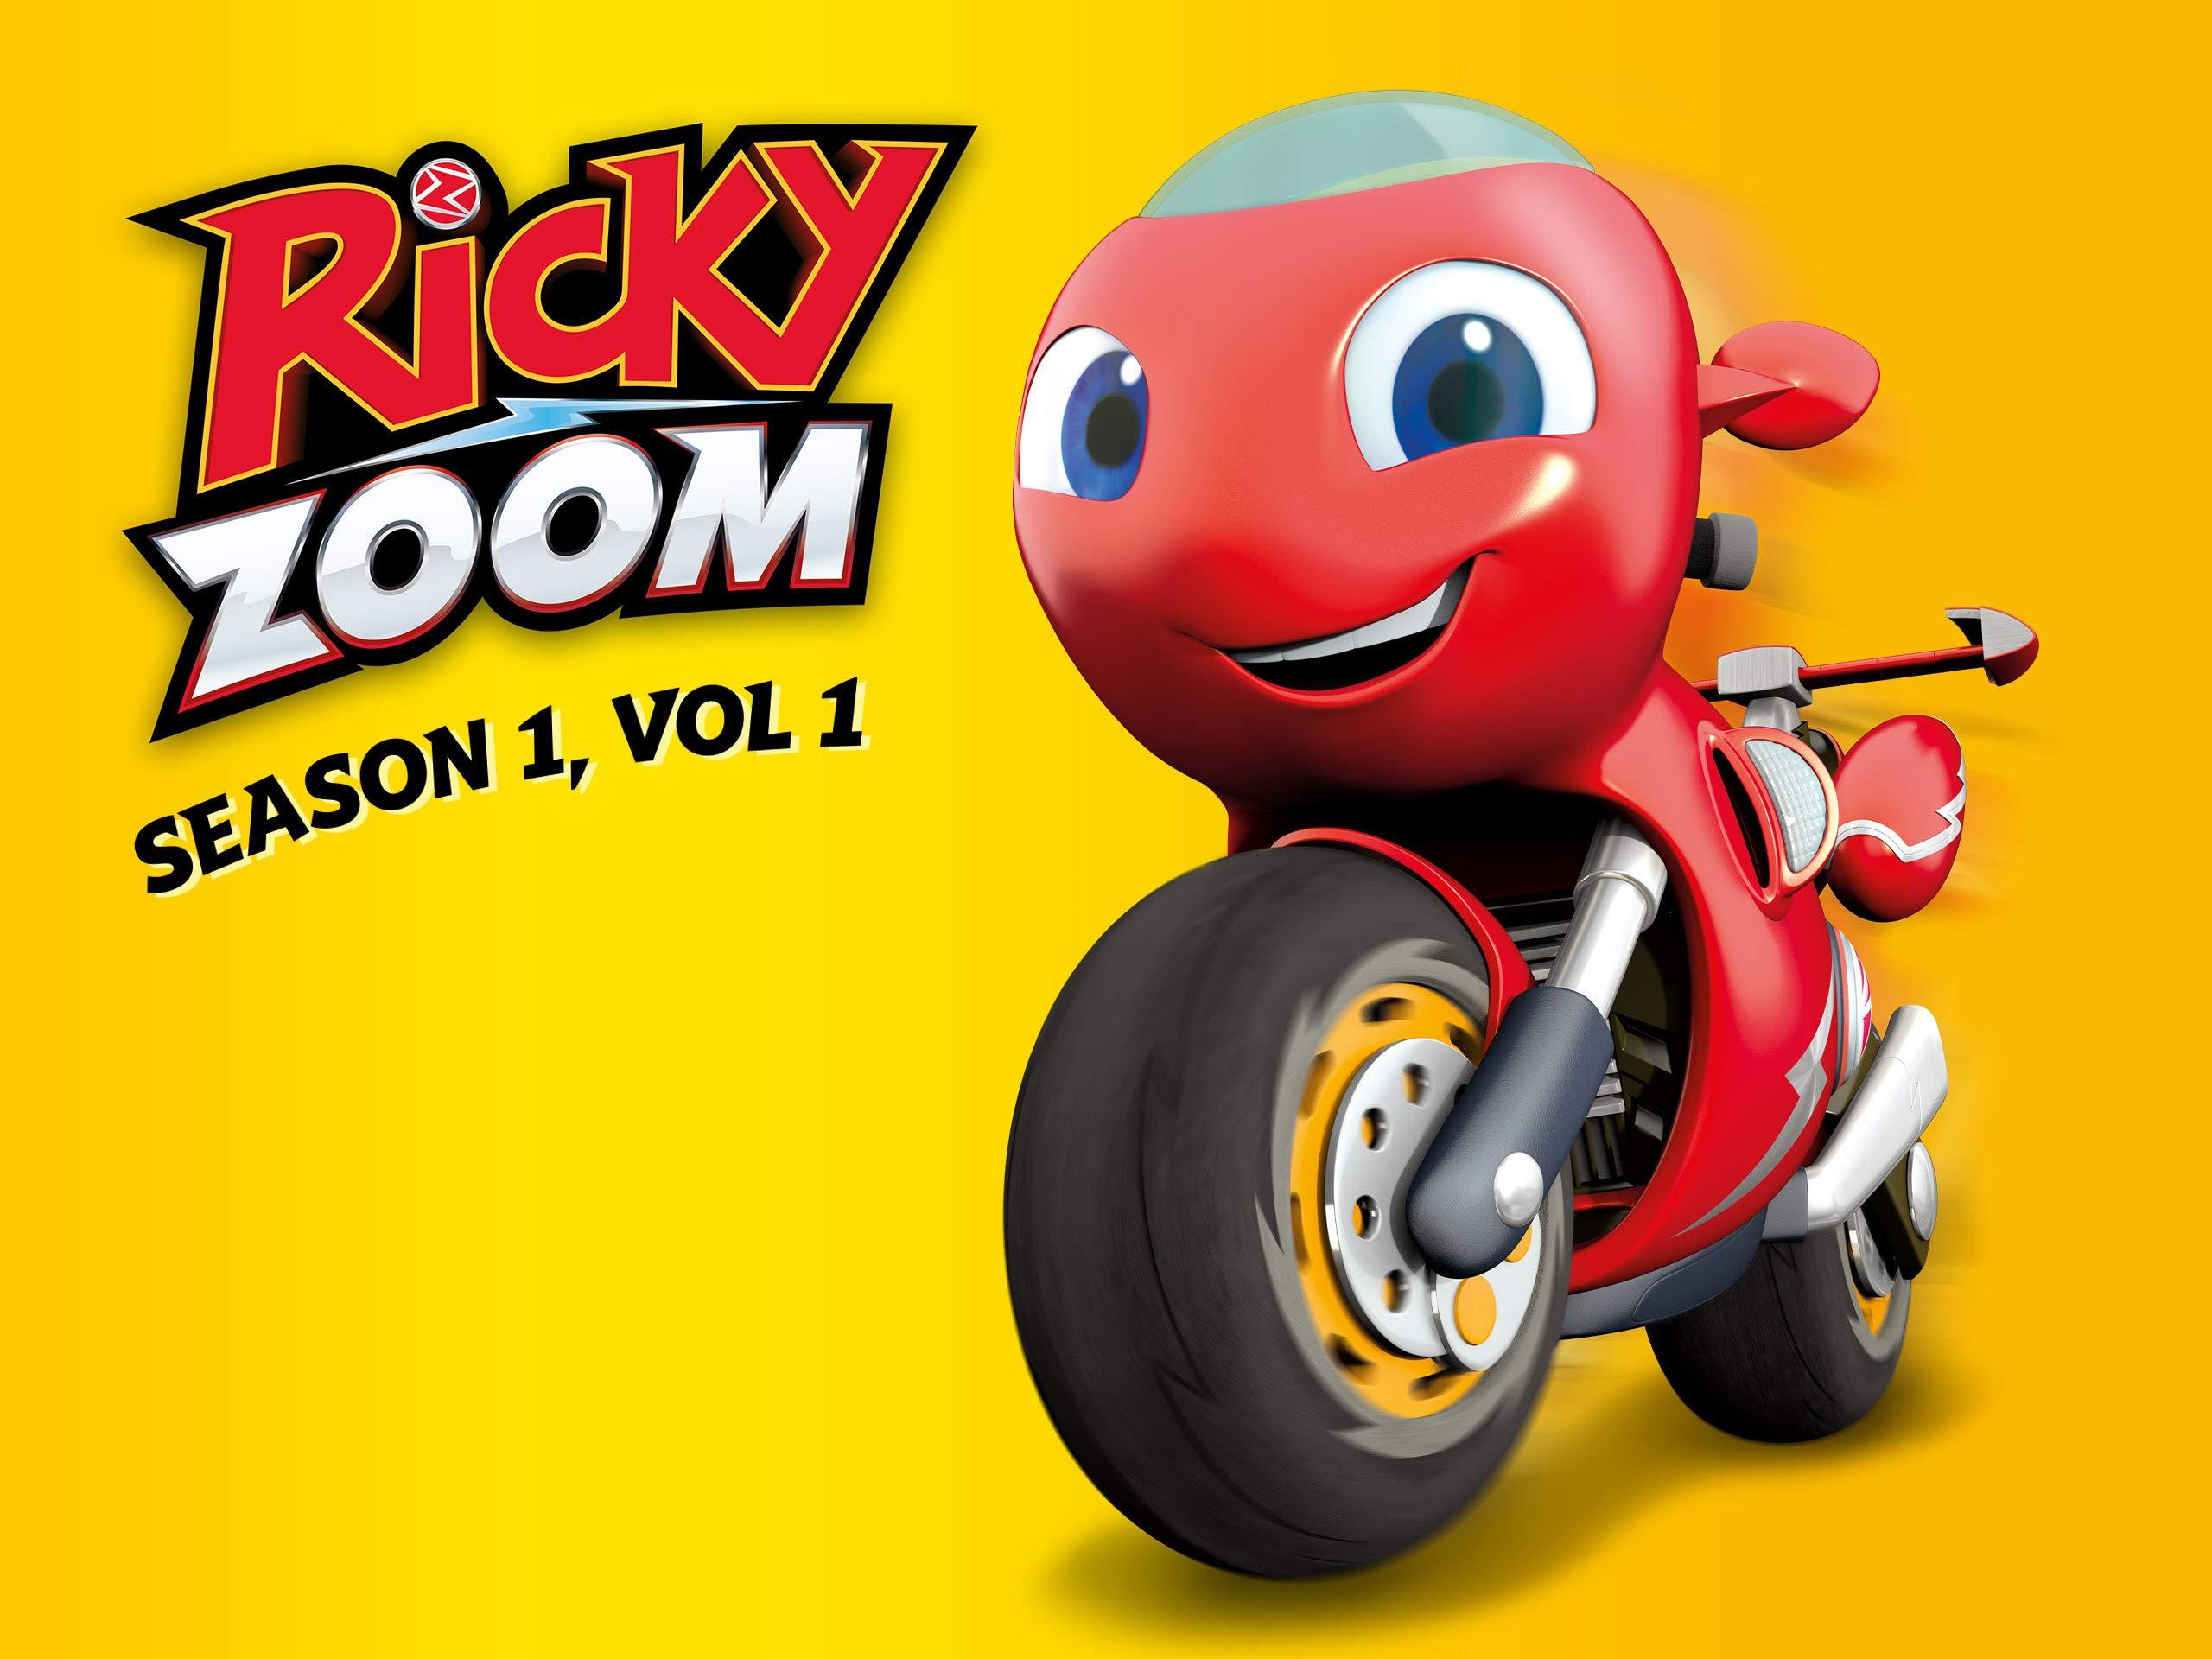 Ricky Zoom